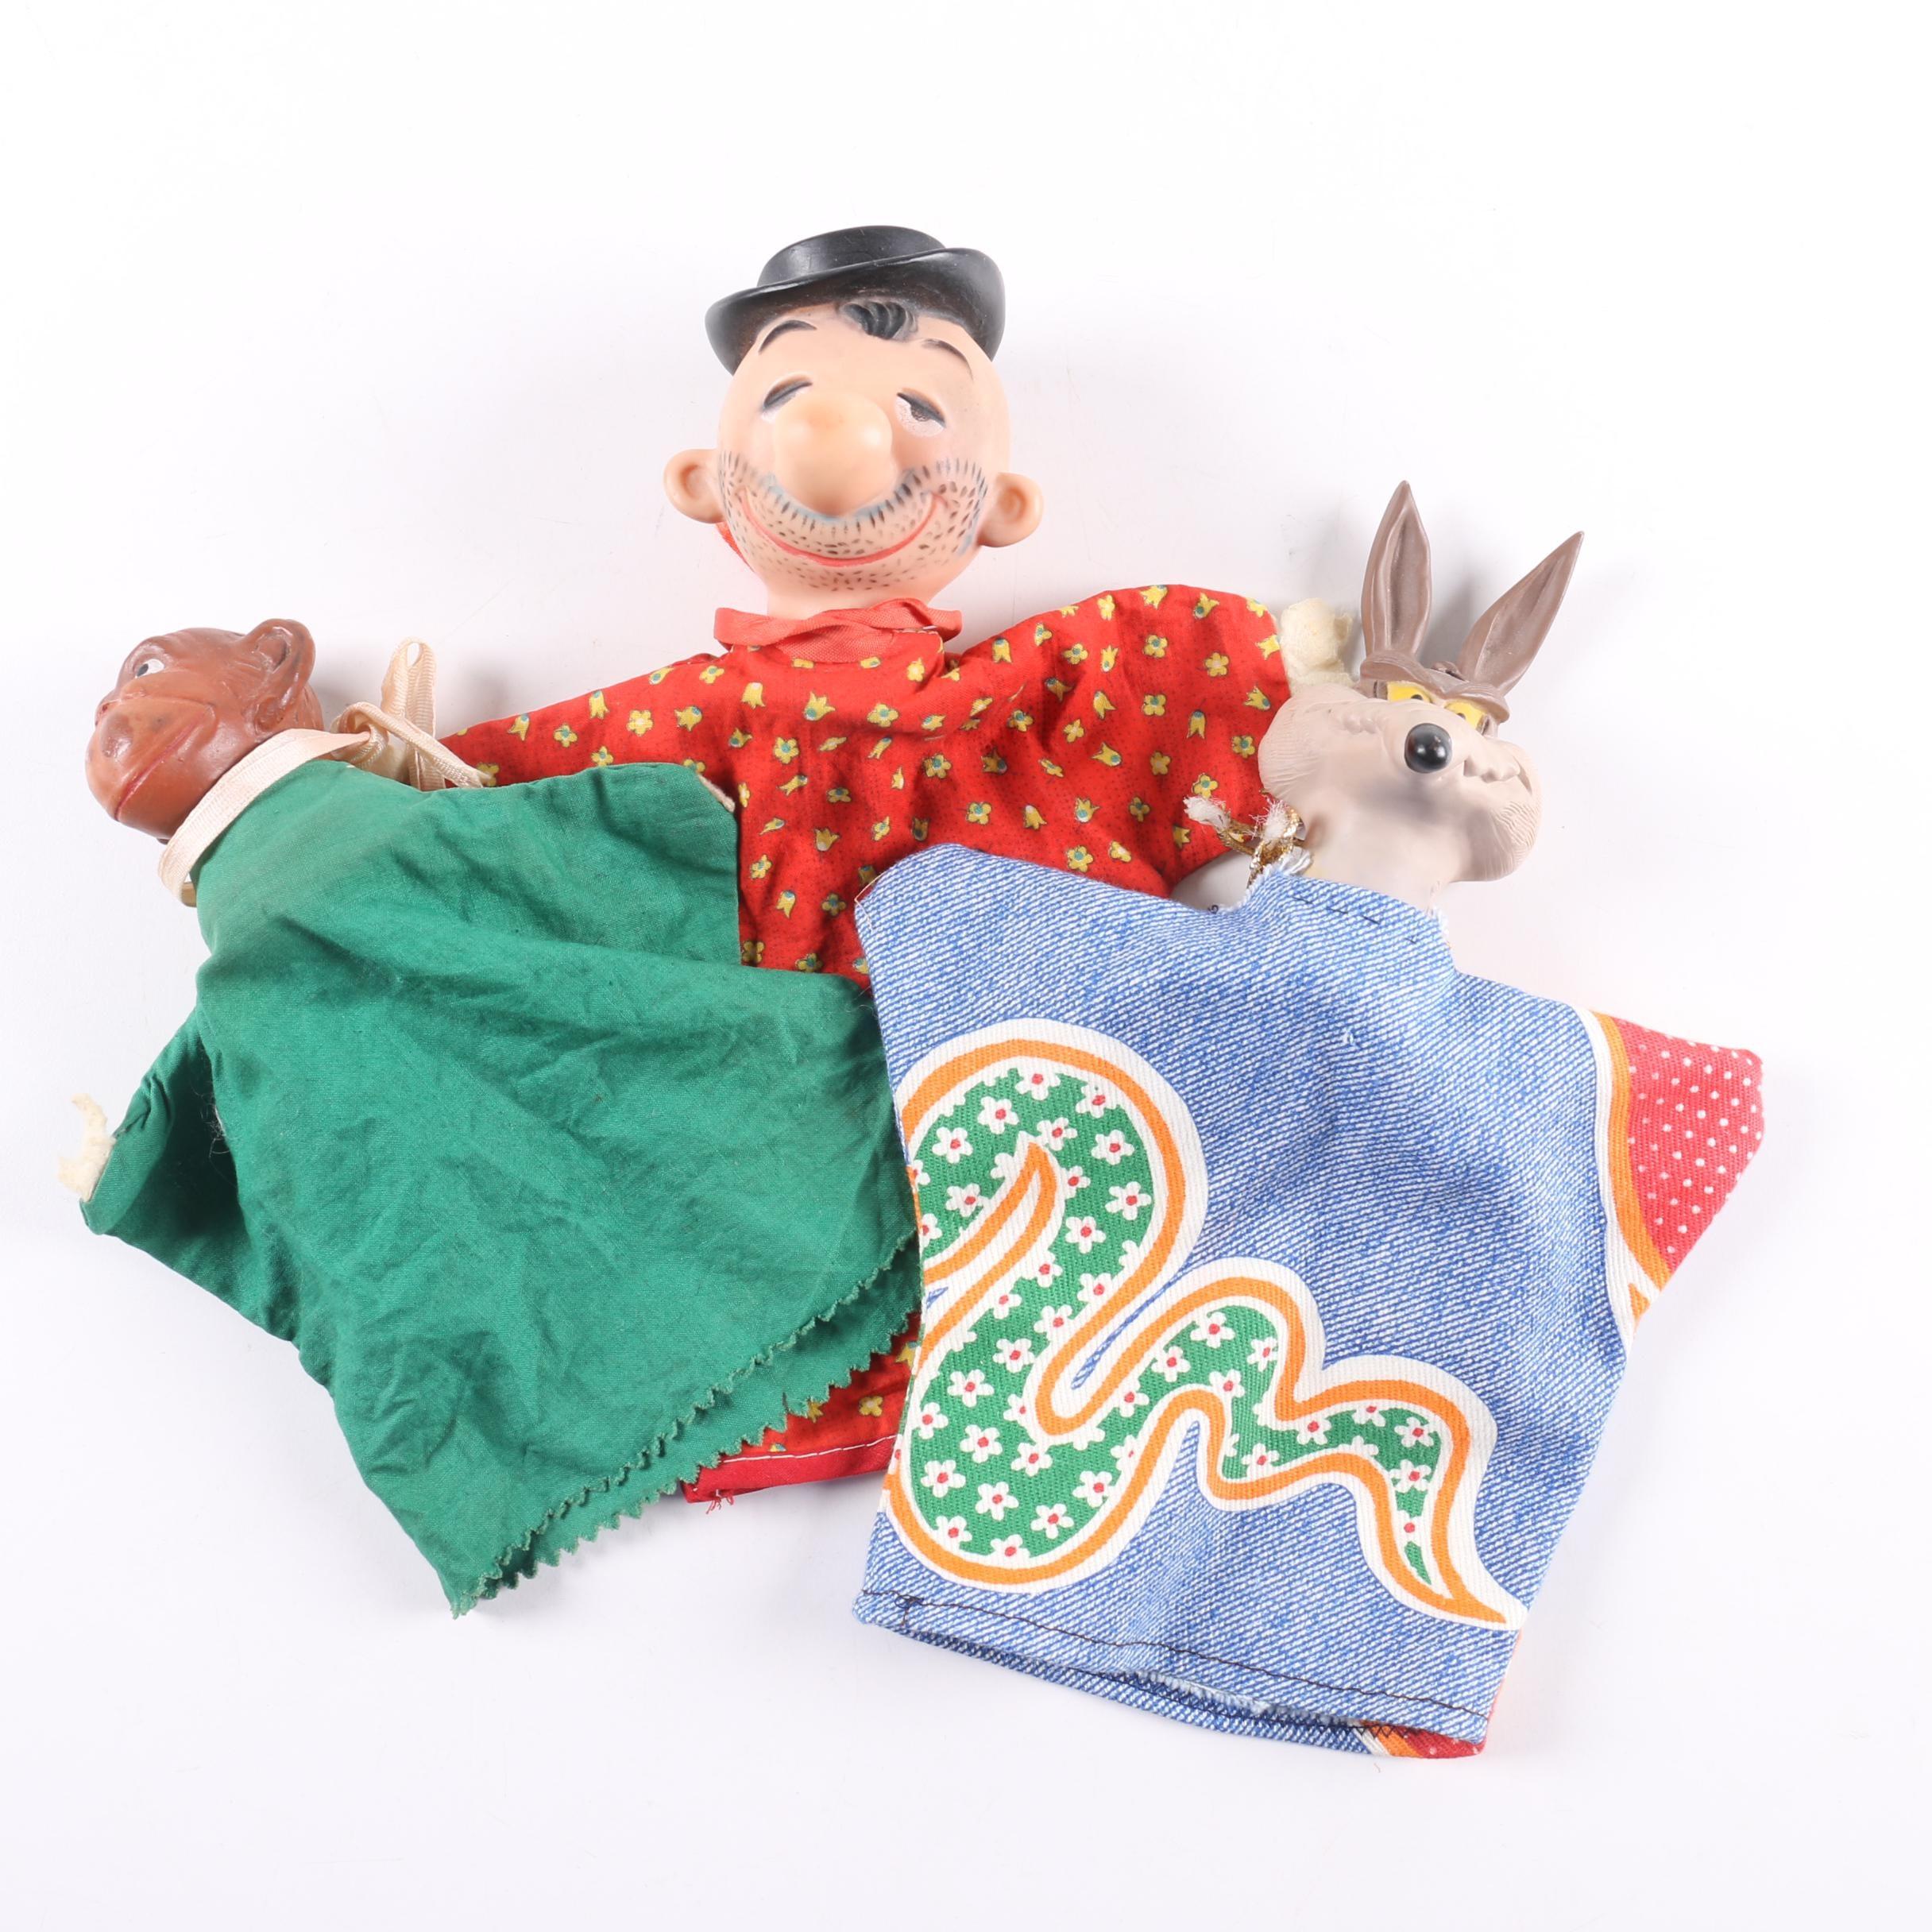 Vintage Gundikin Puppets